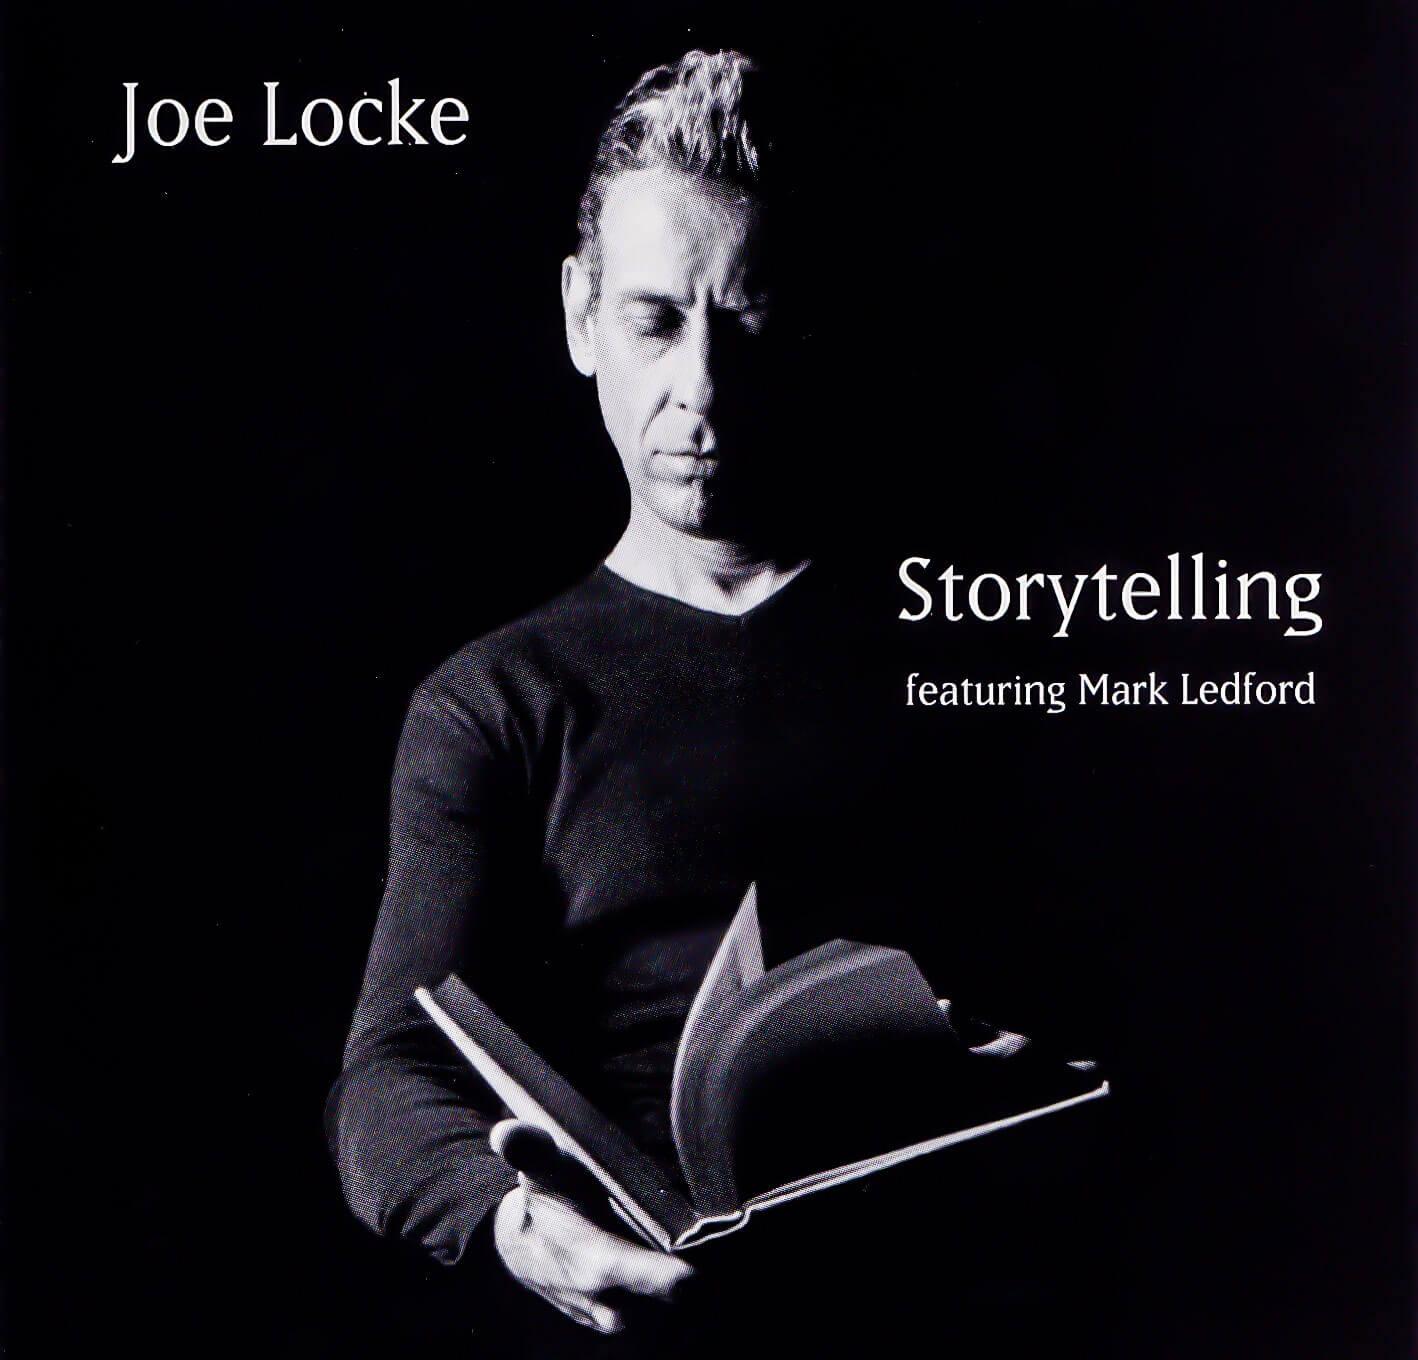 Joe Locke - Storytelling